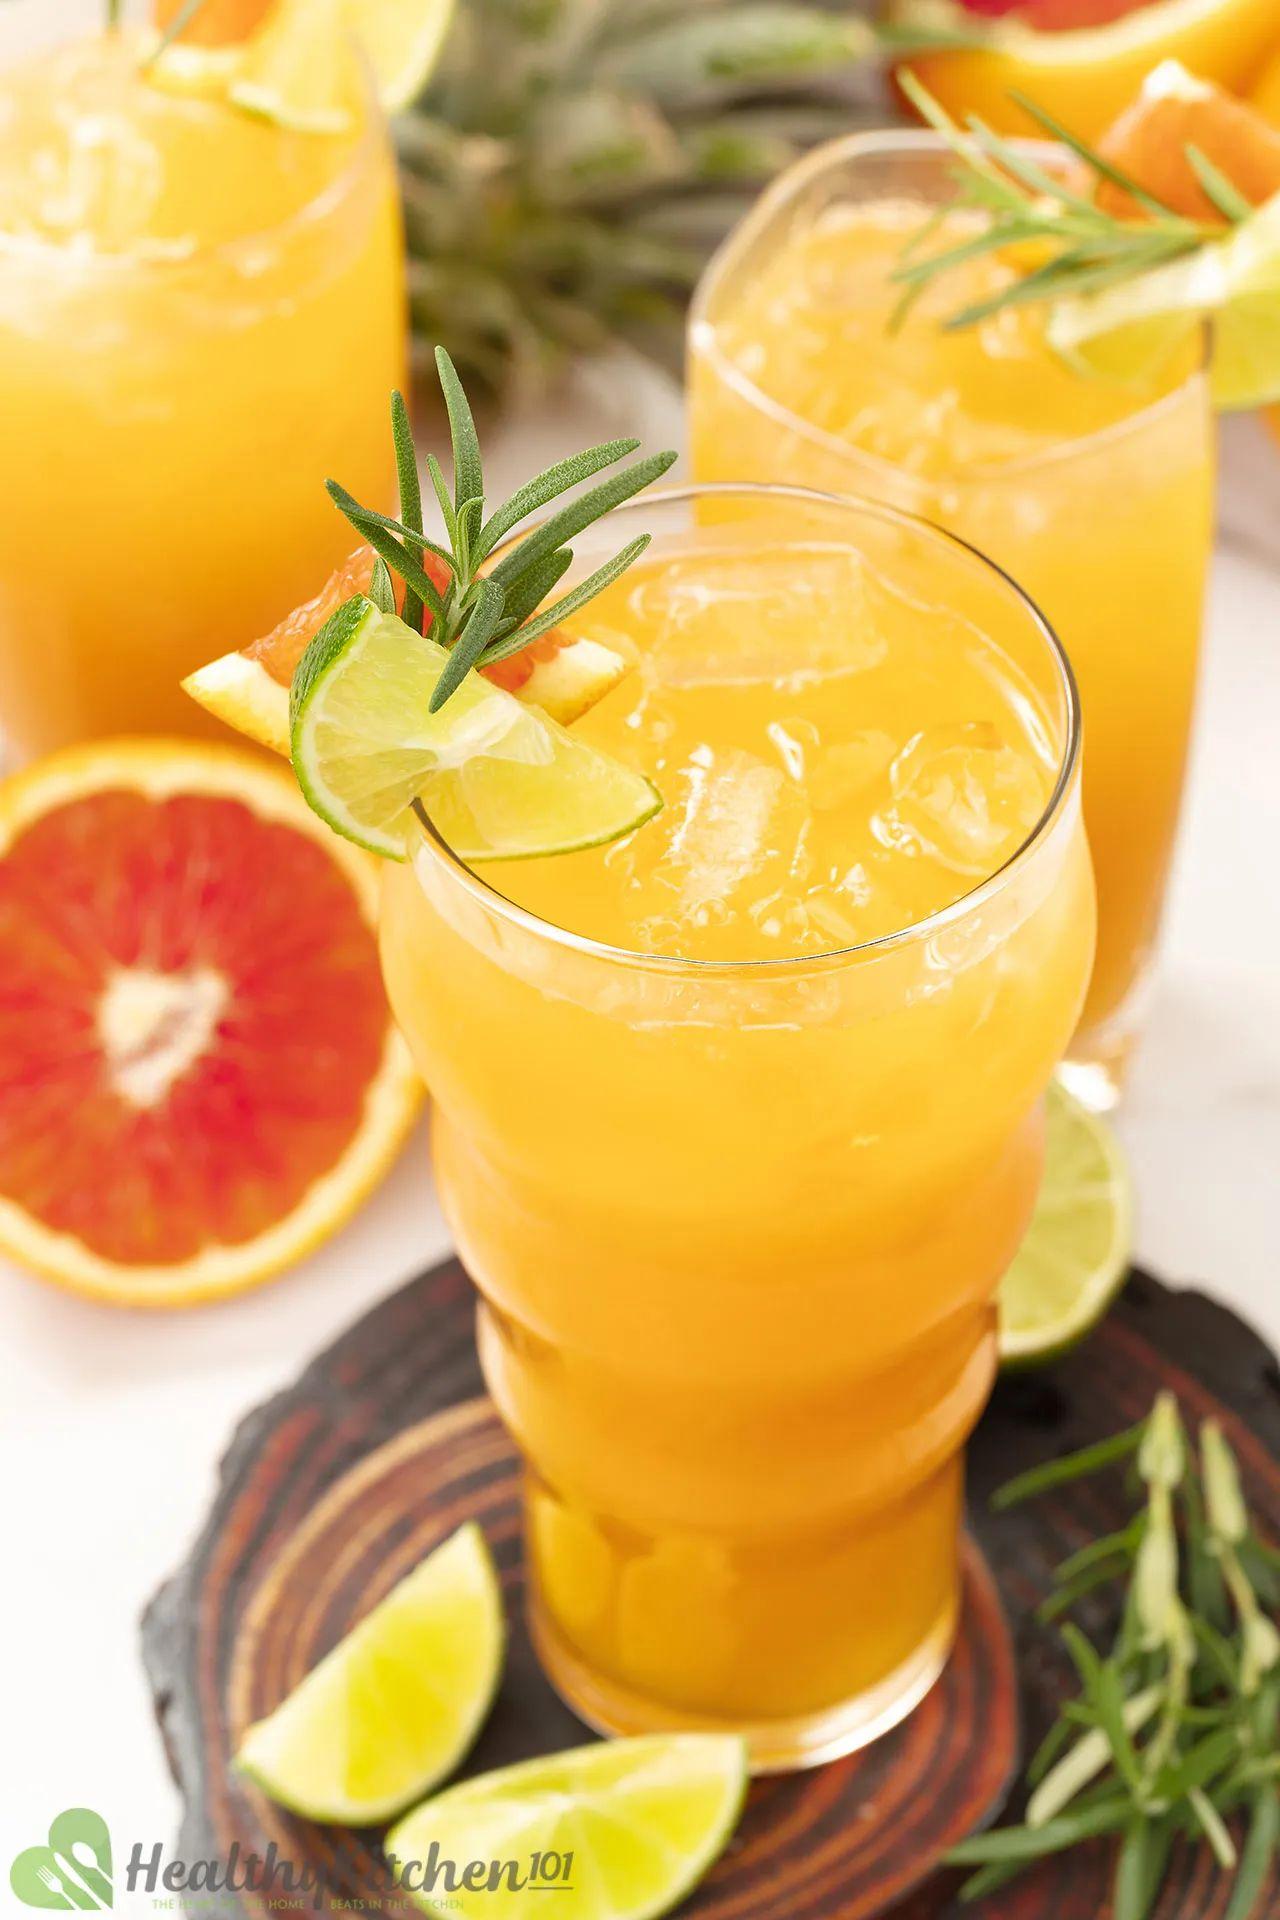 Homemade Tequila and Grapefruit Juice Recipe